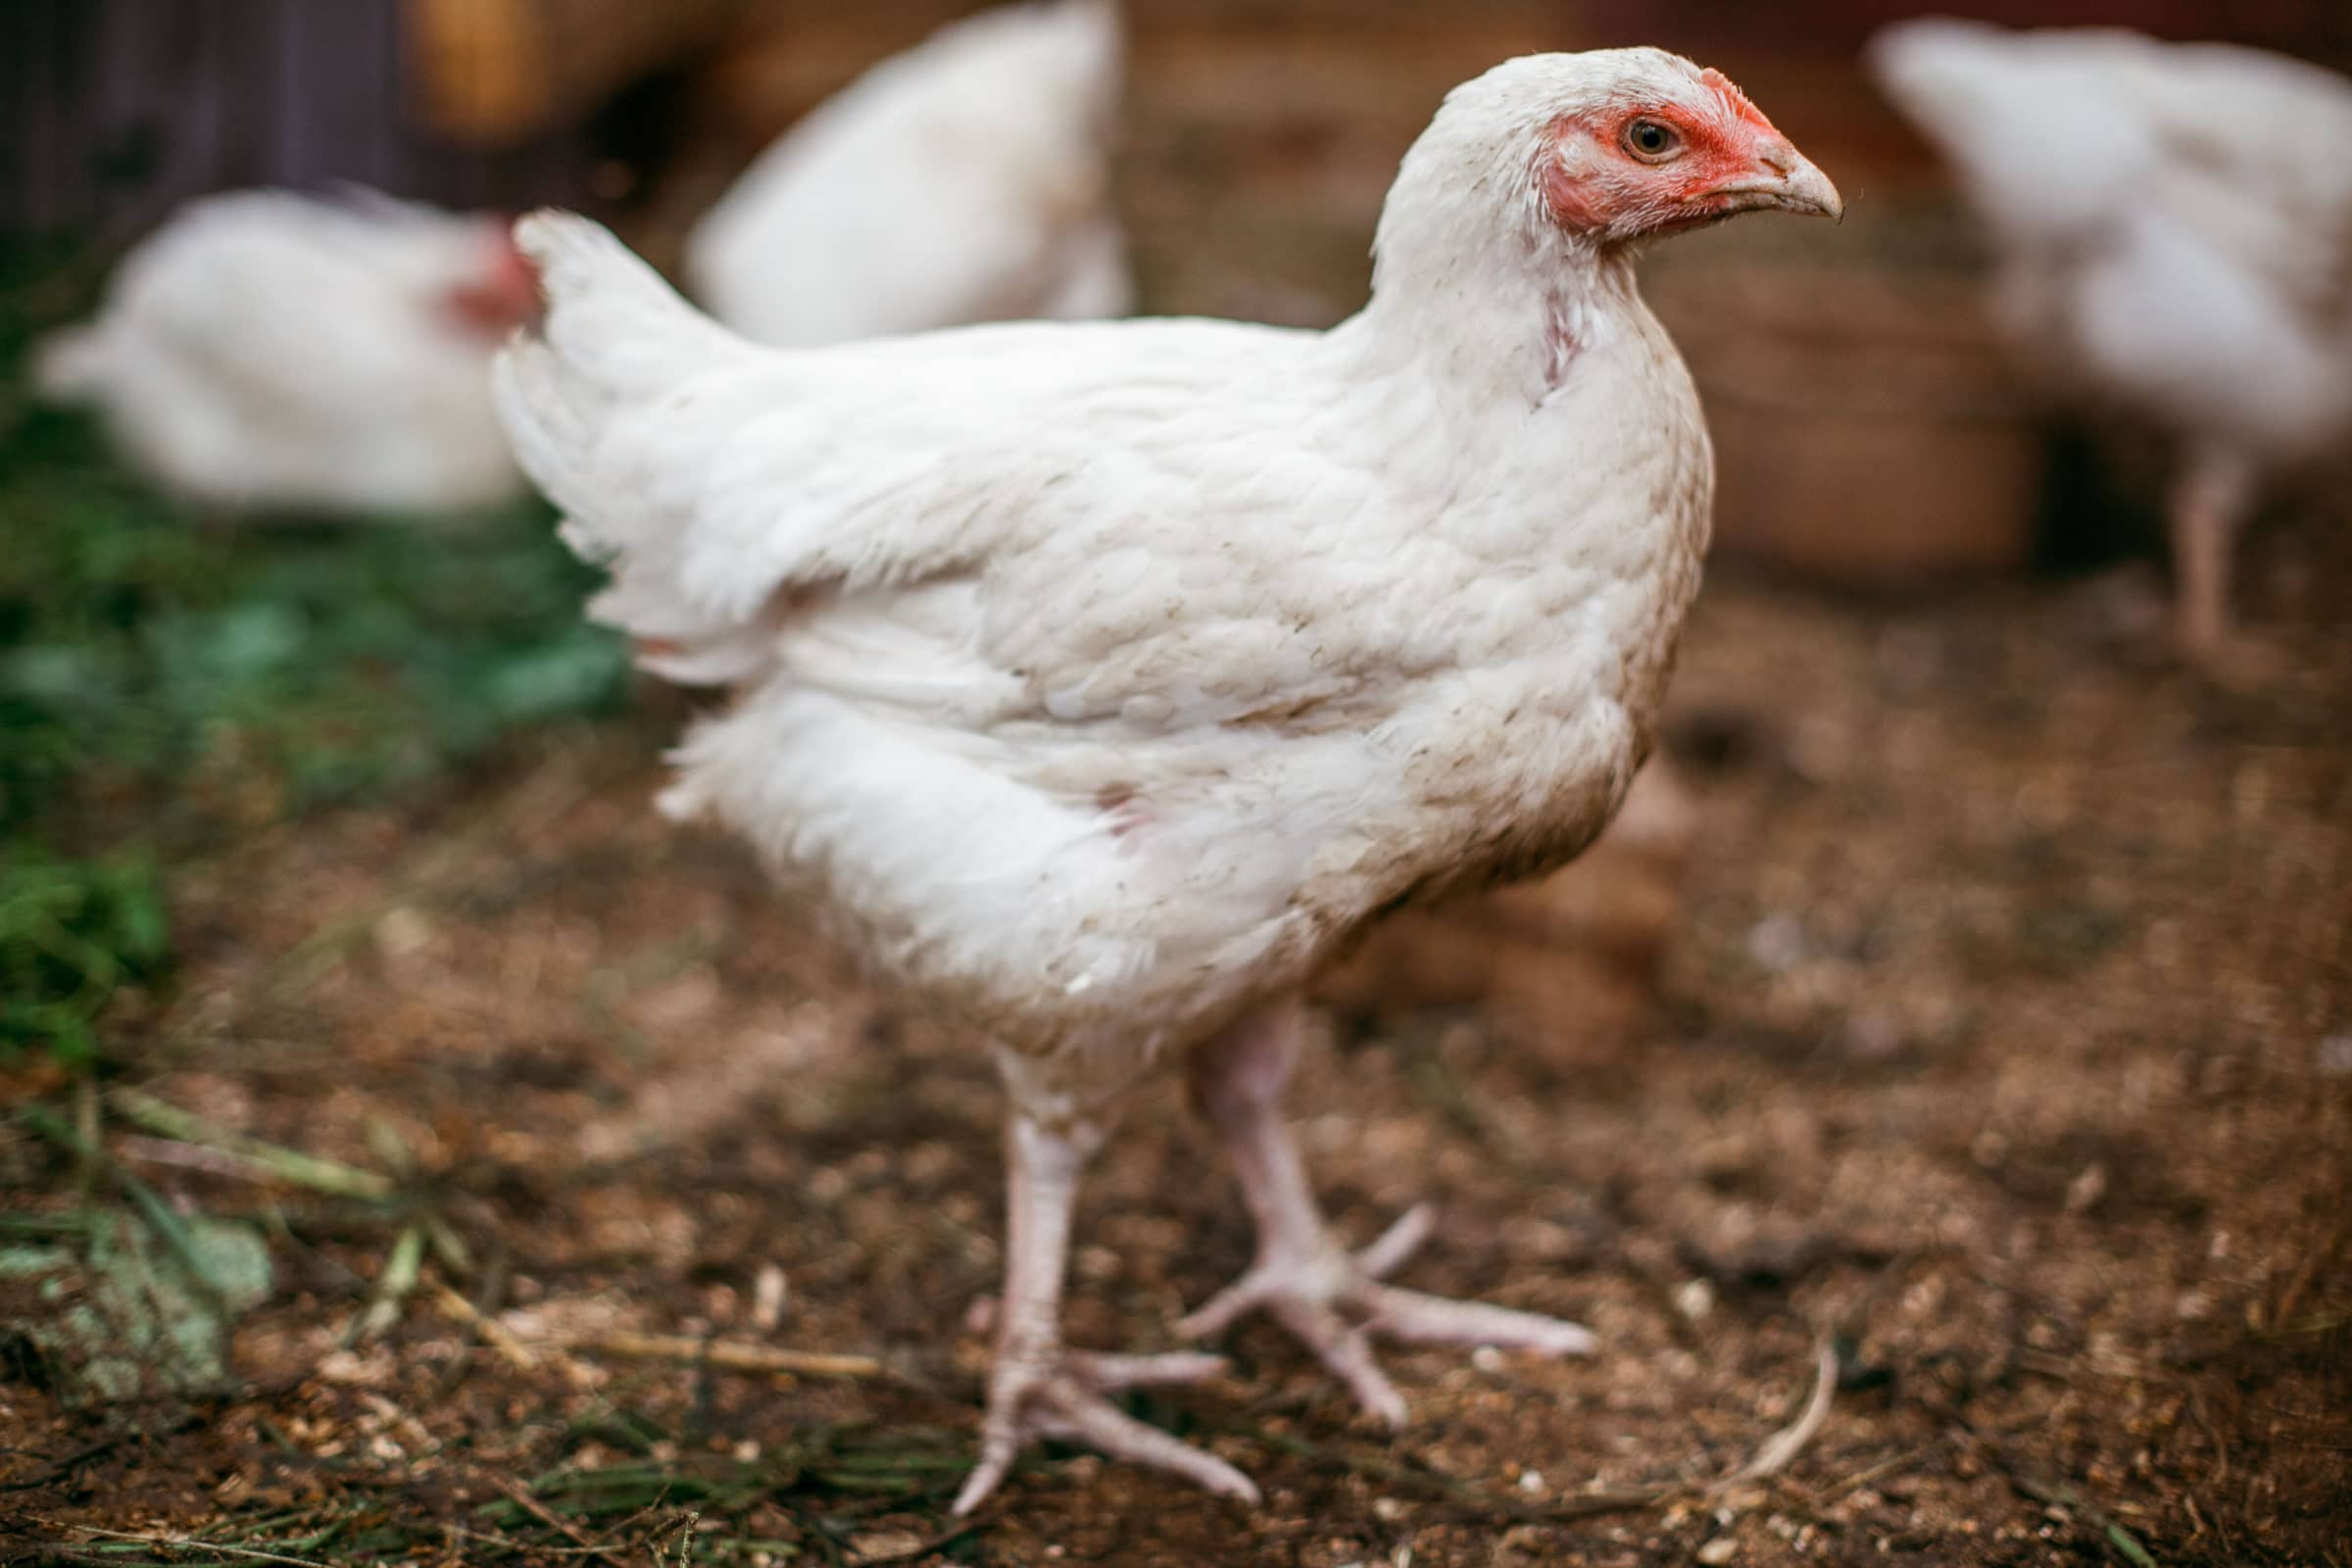 A broiler chicken in the chicken coop.